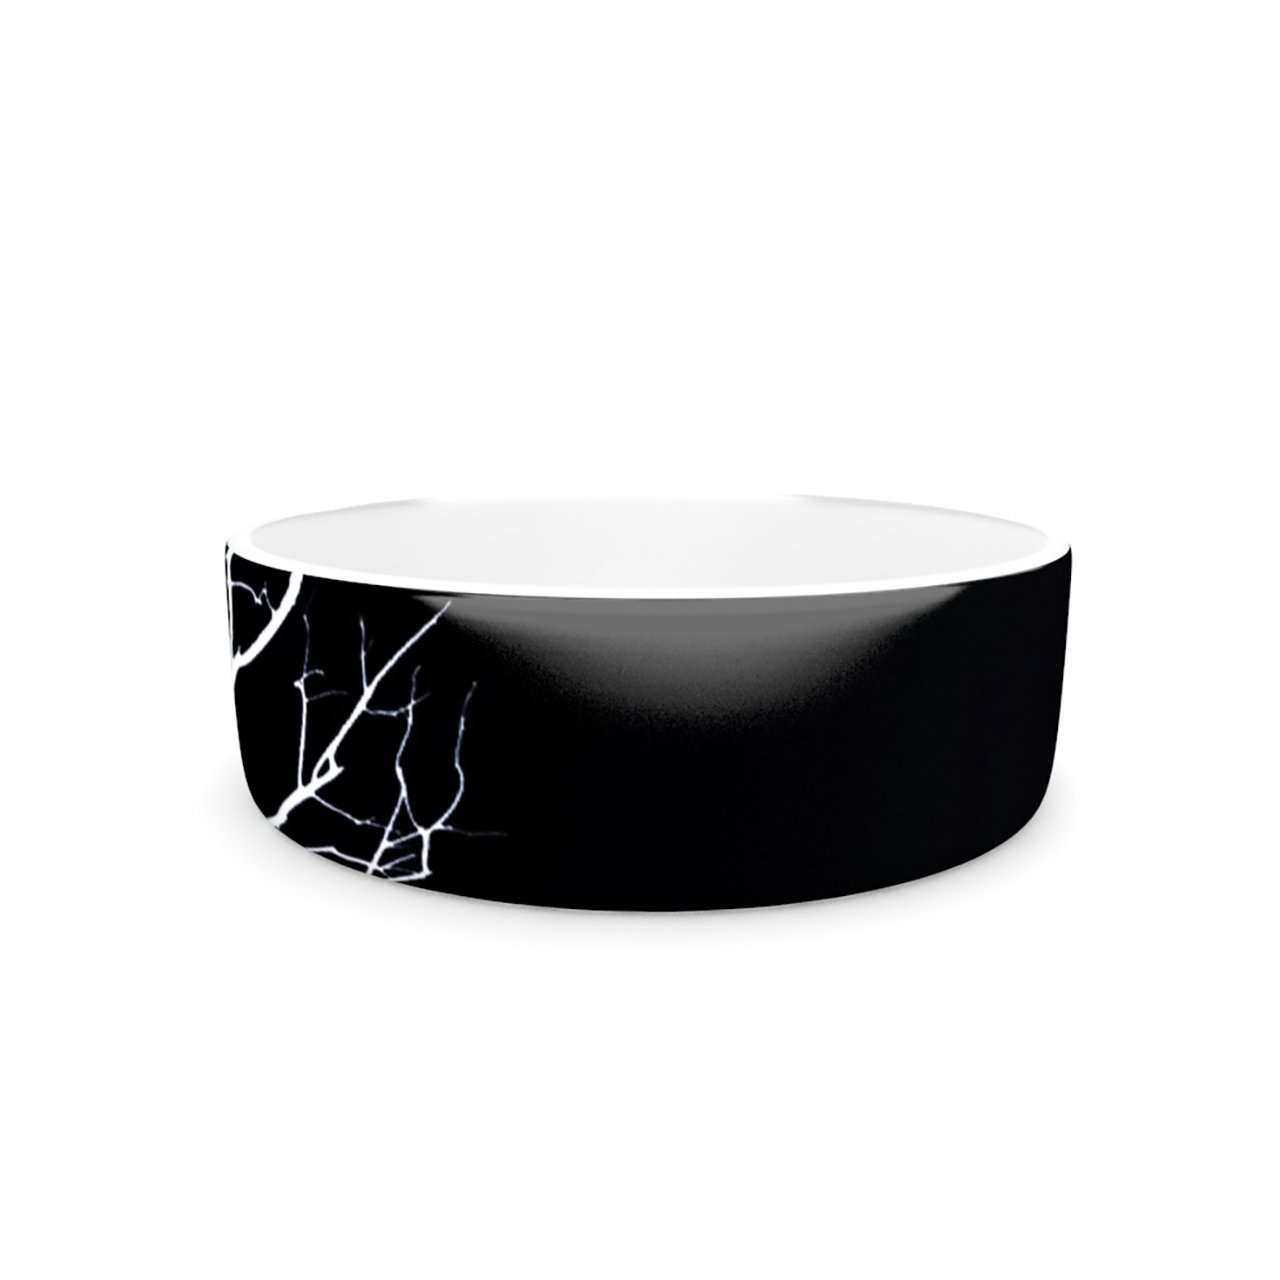 Kess InHouse Skye Zambrana Winter Black Pet Bowl, 7-Inch